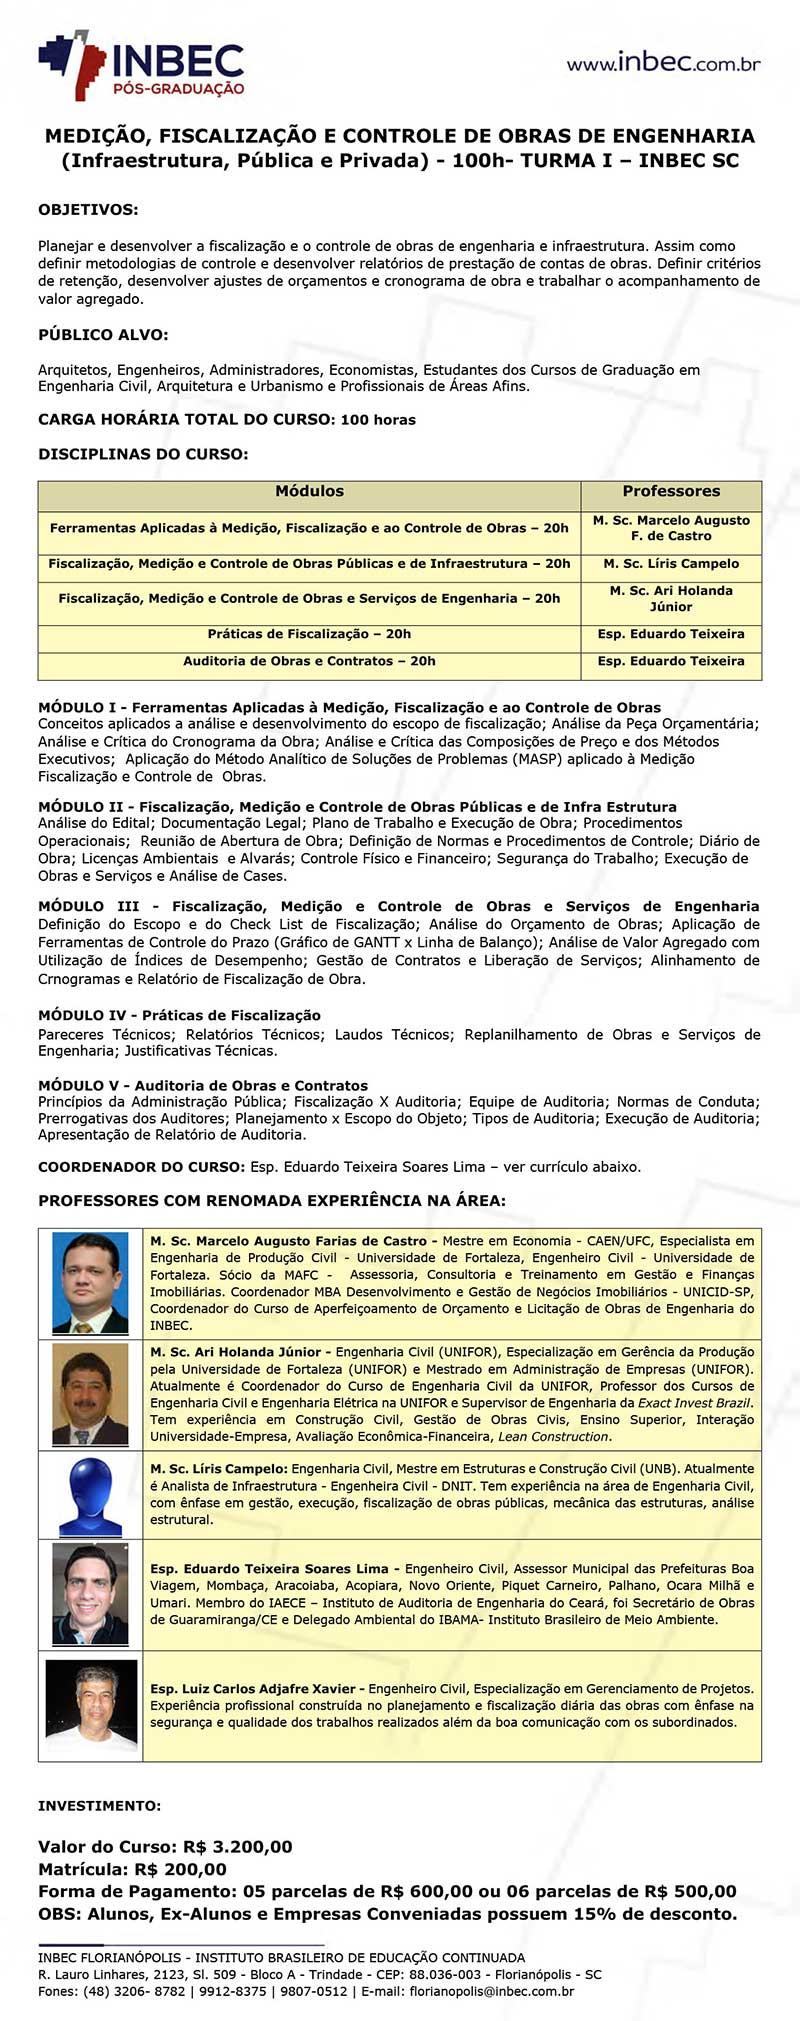 medicaoefiscalizacaodeobra